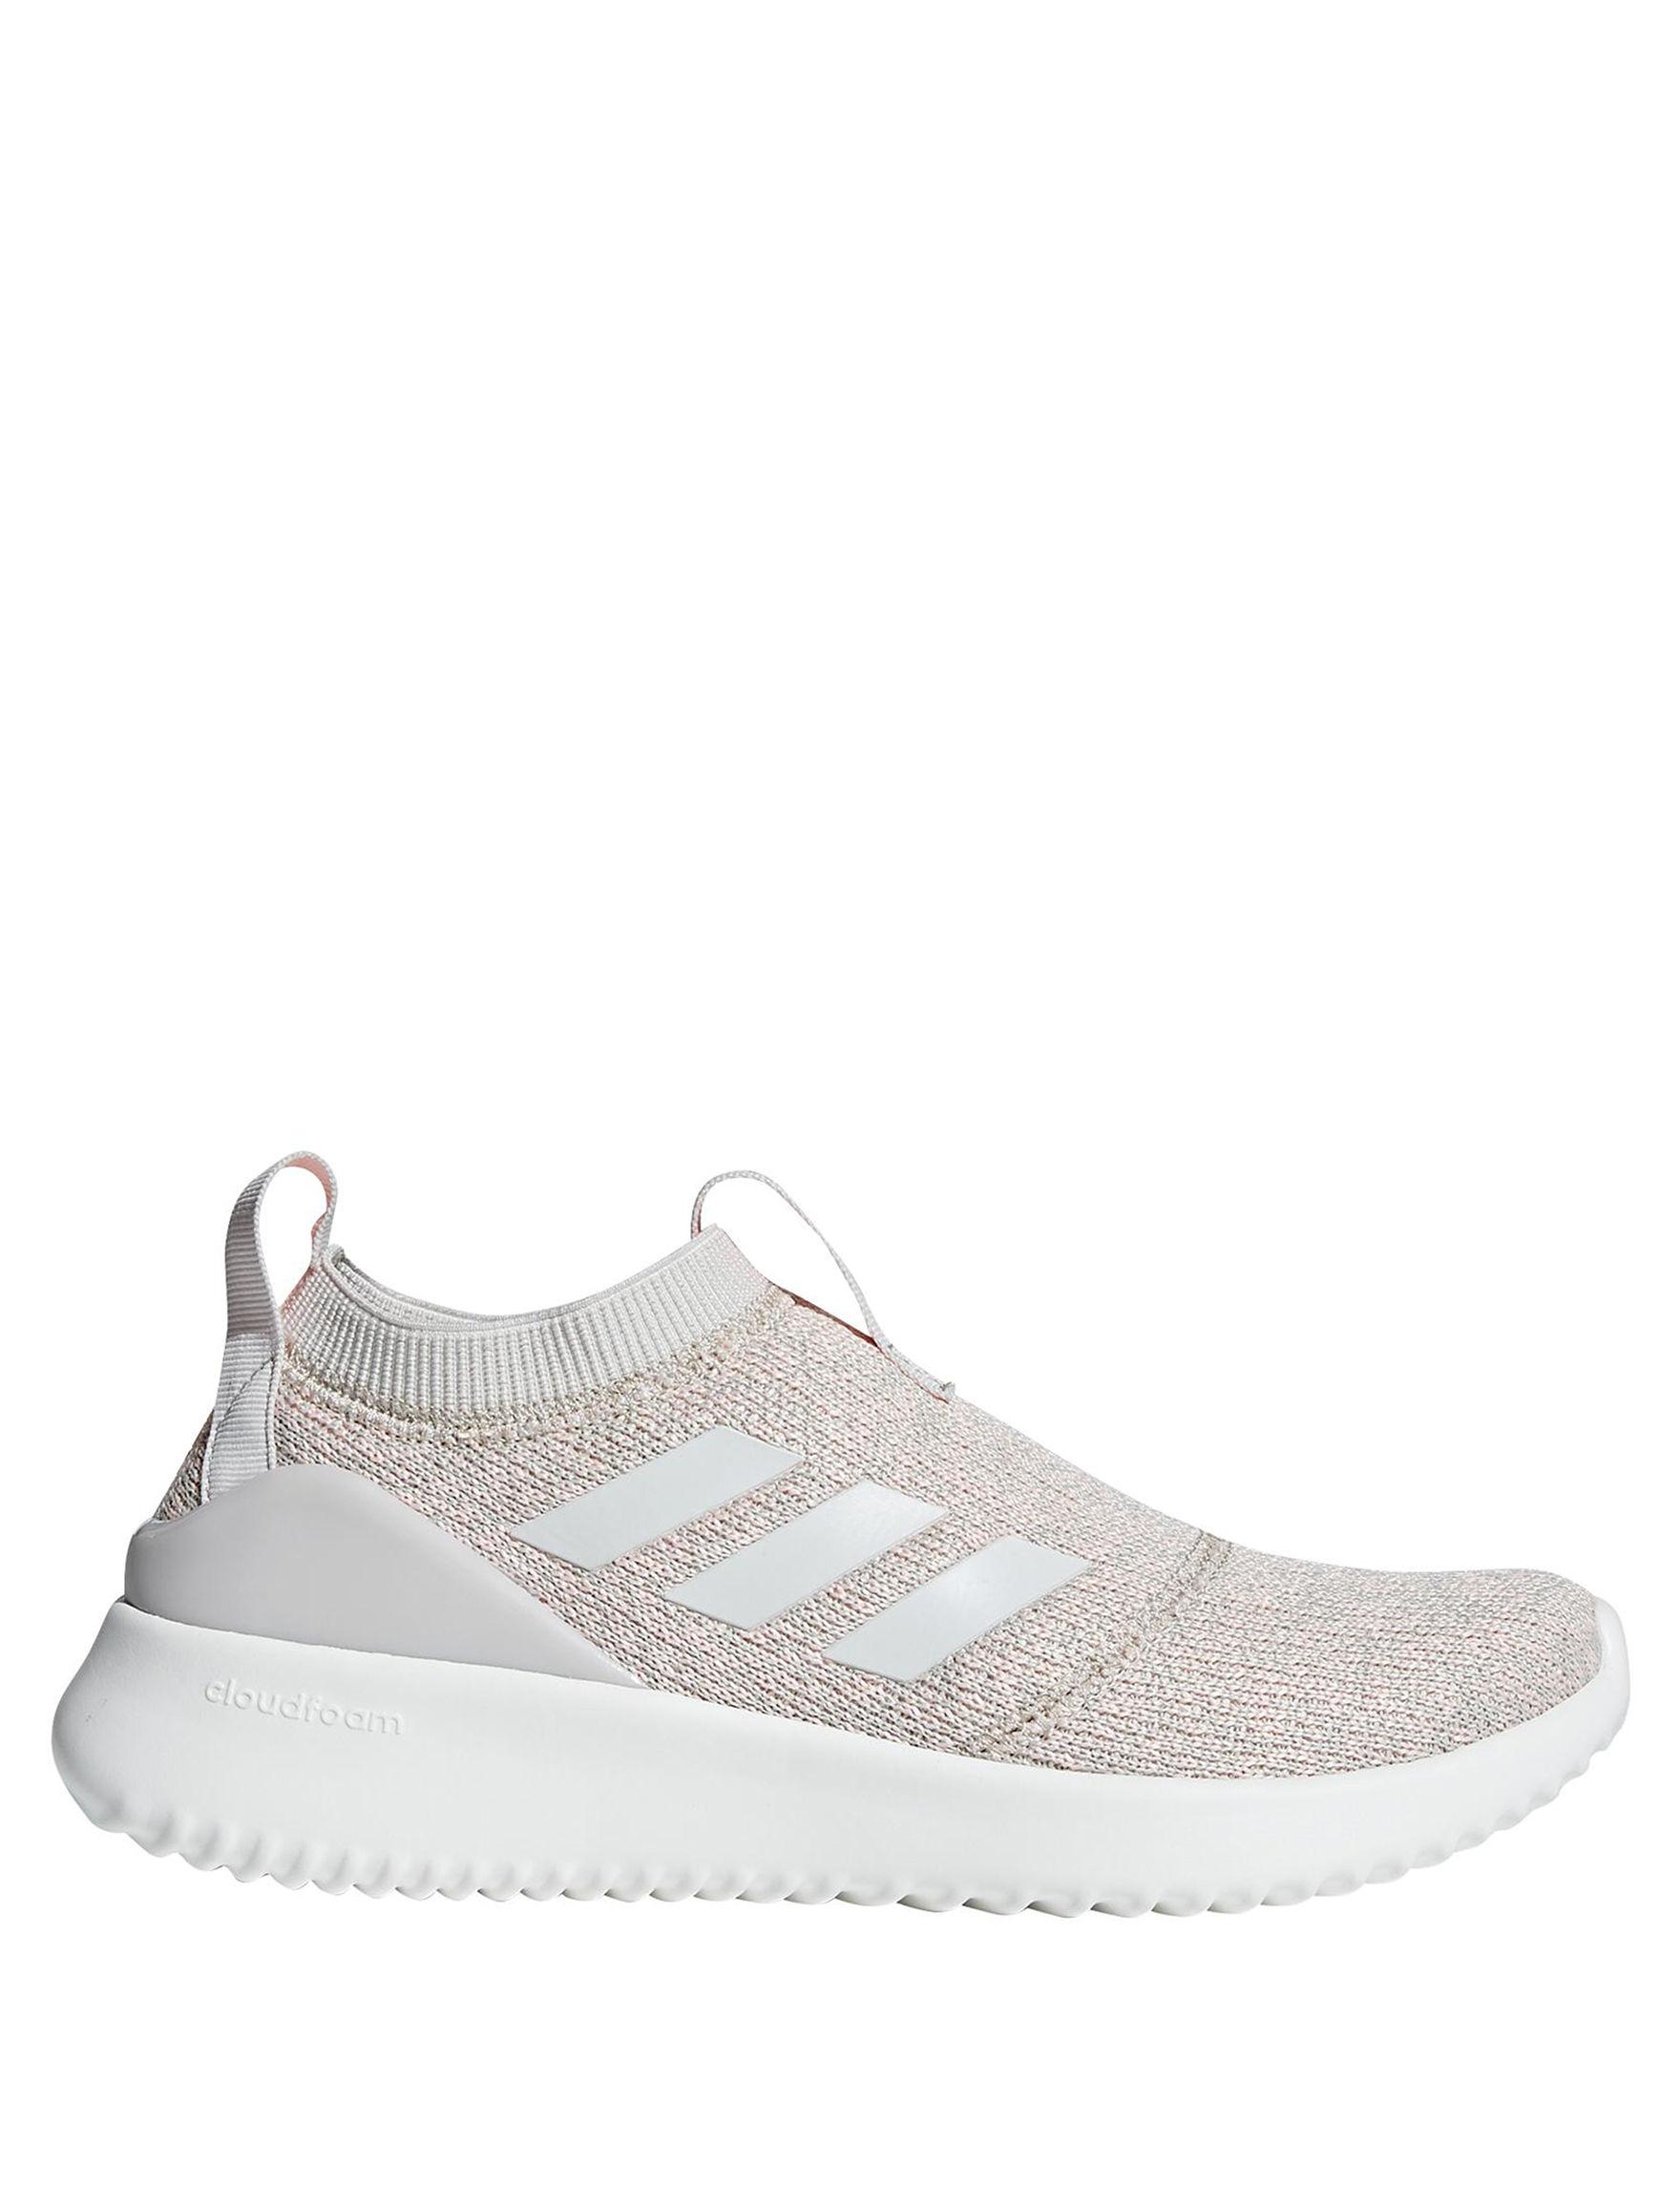 Adidas Ivory